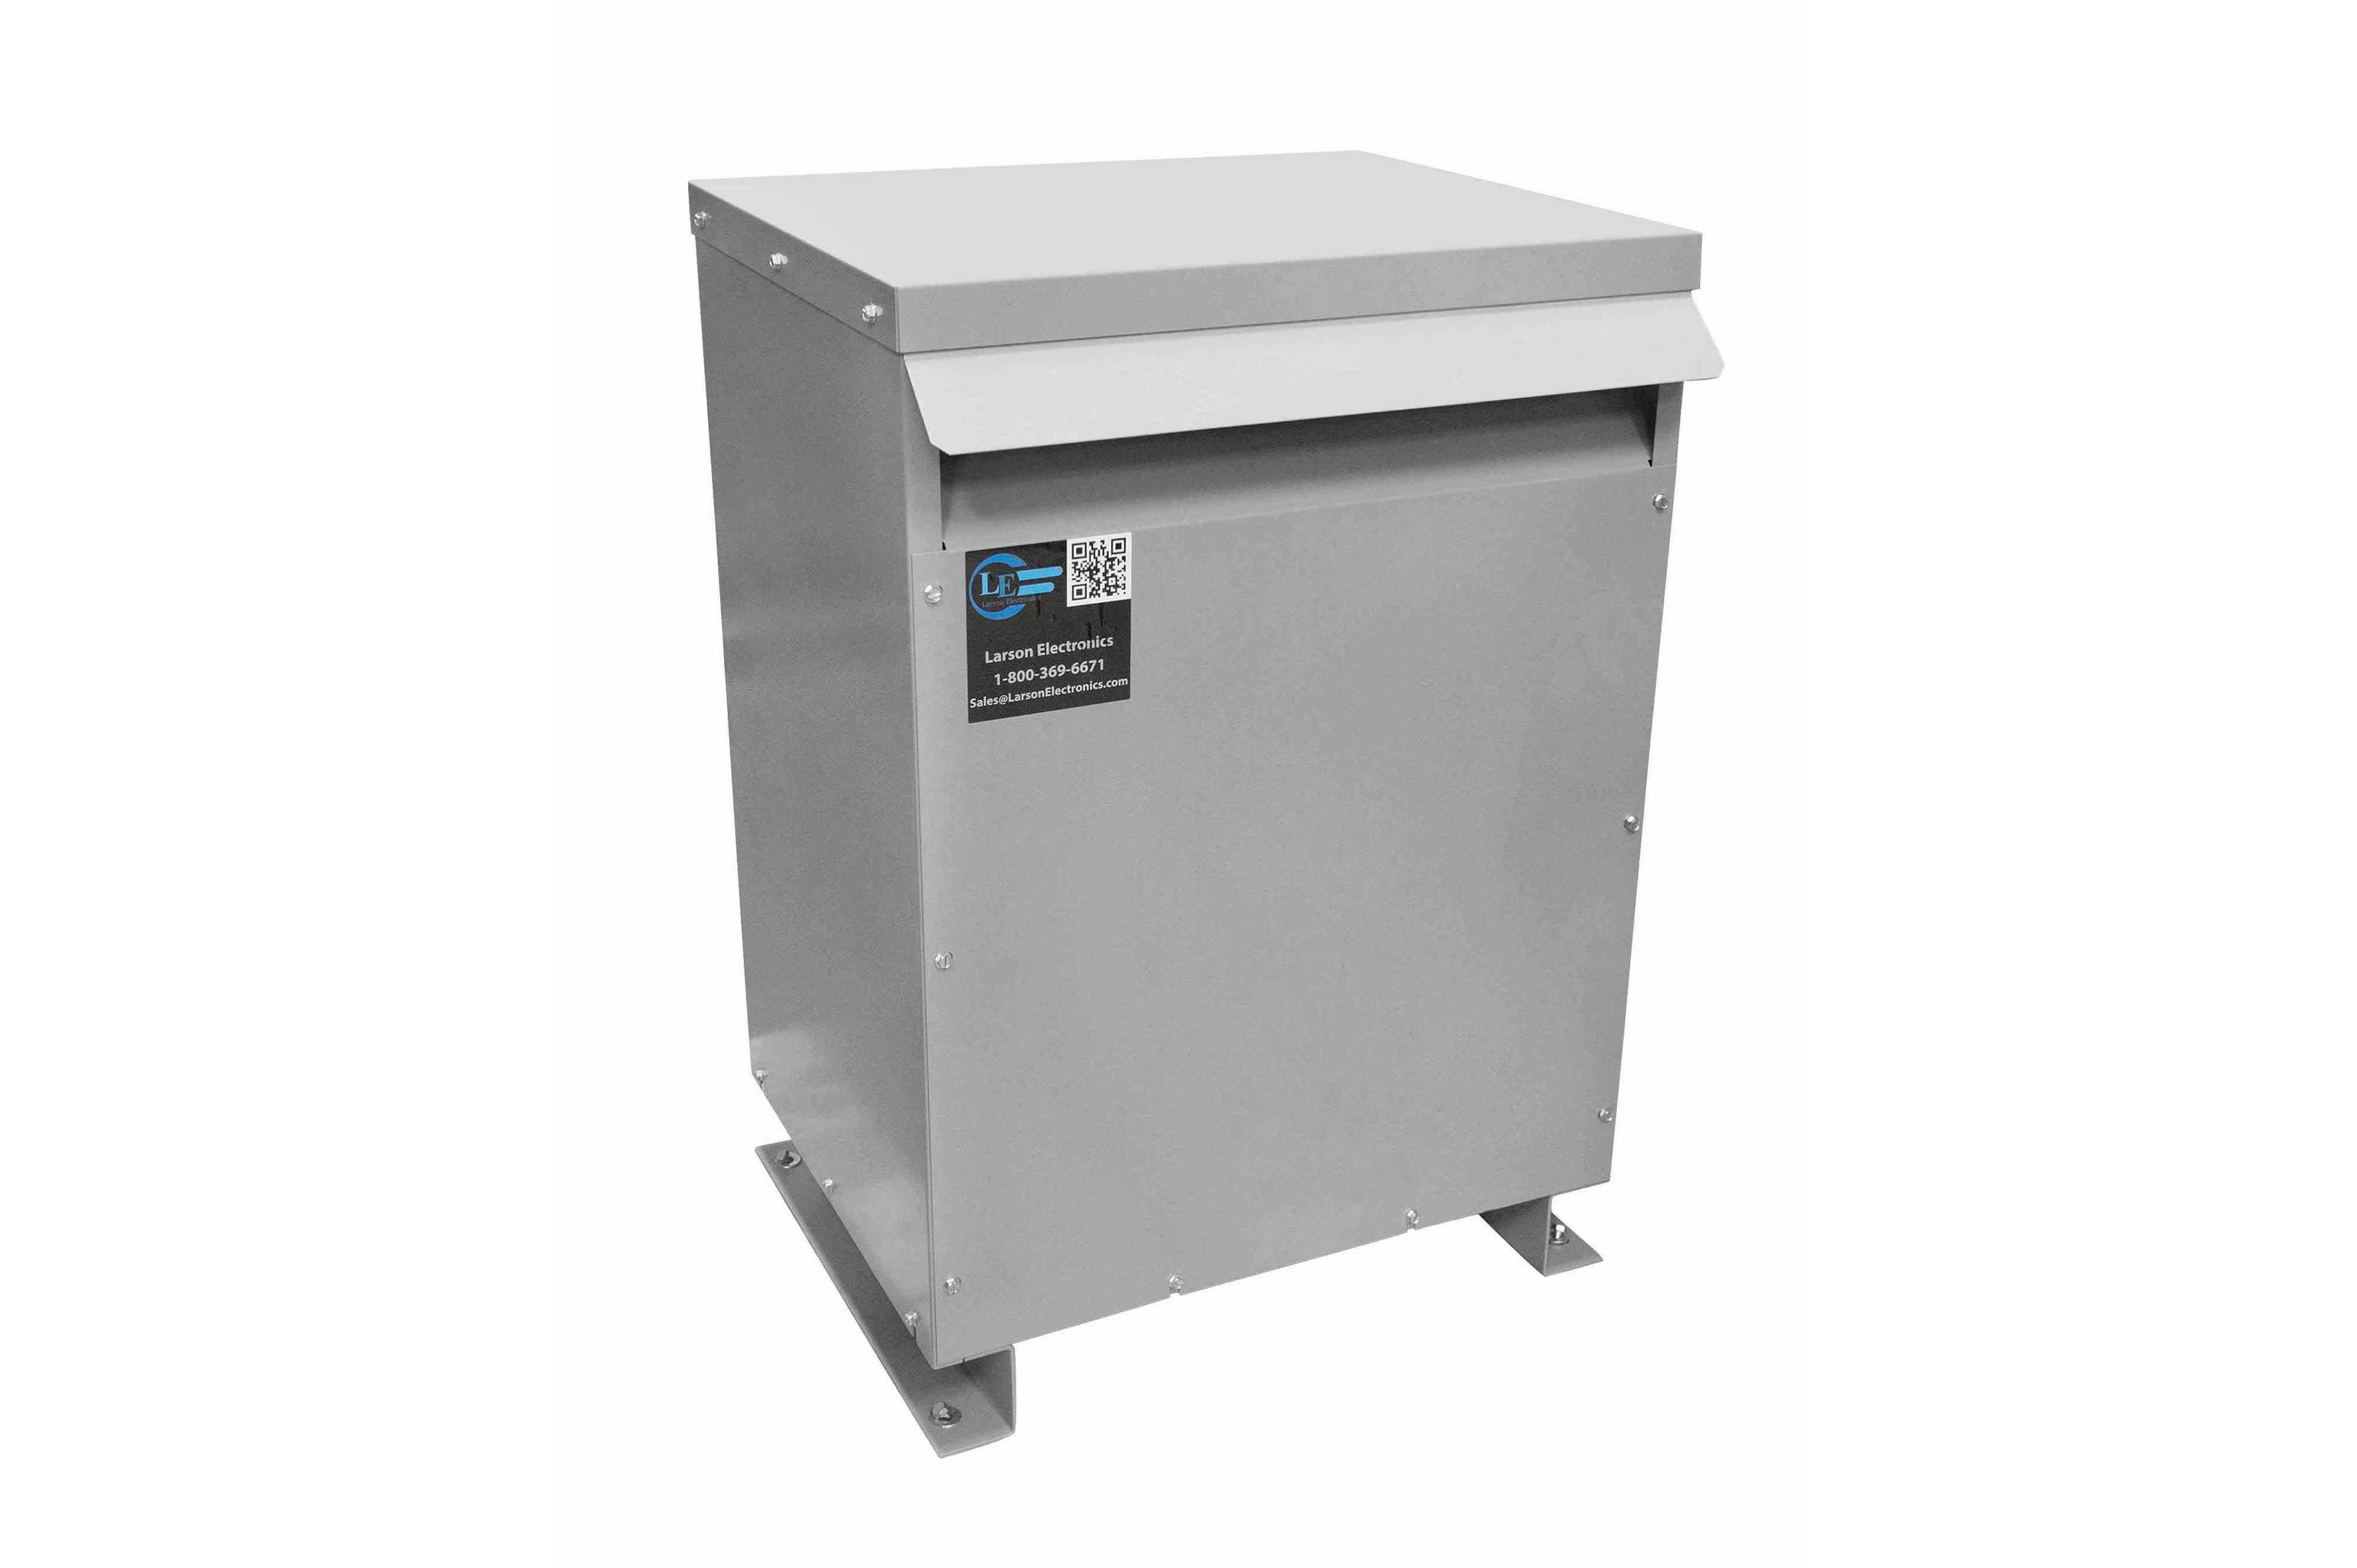 750 kVA 3PH Isolation Transformer, 400V Wye Primary, 240V Delta Secondary, N3R, Ventilated, 60 Hz